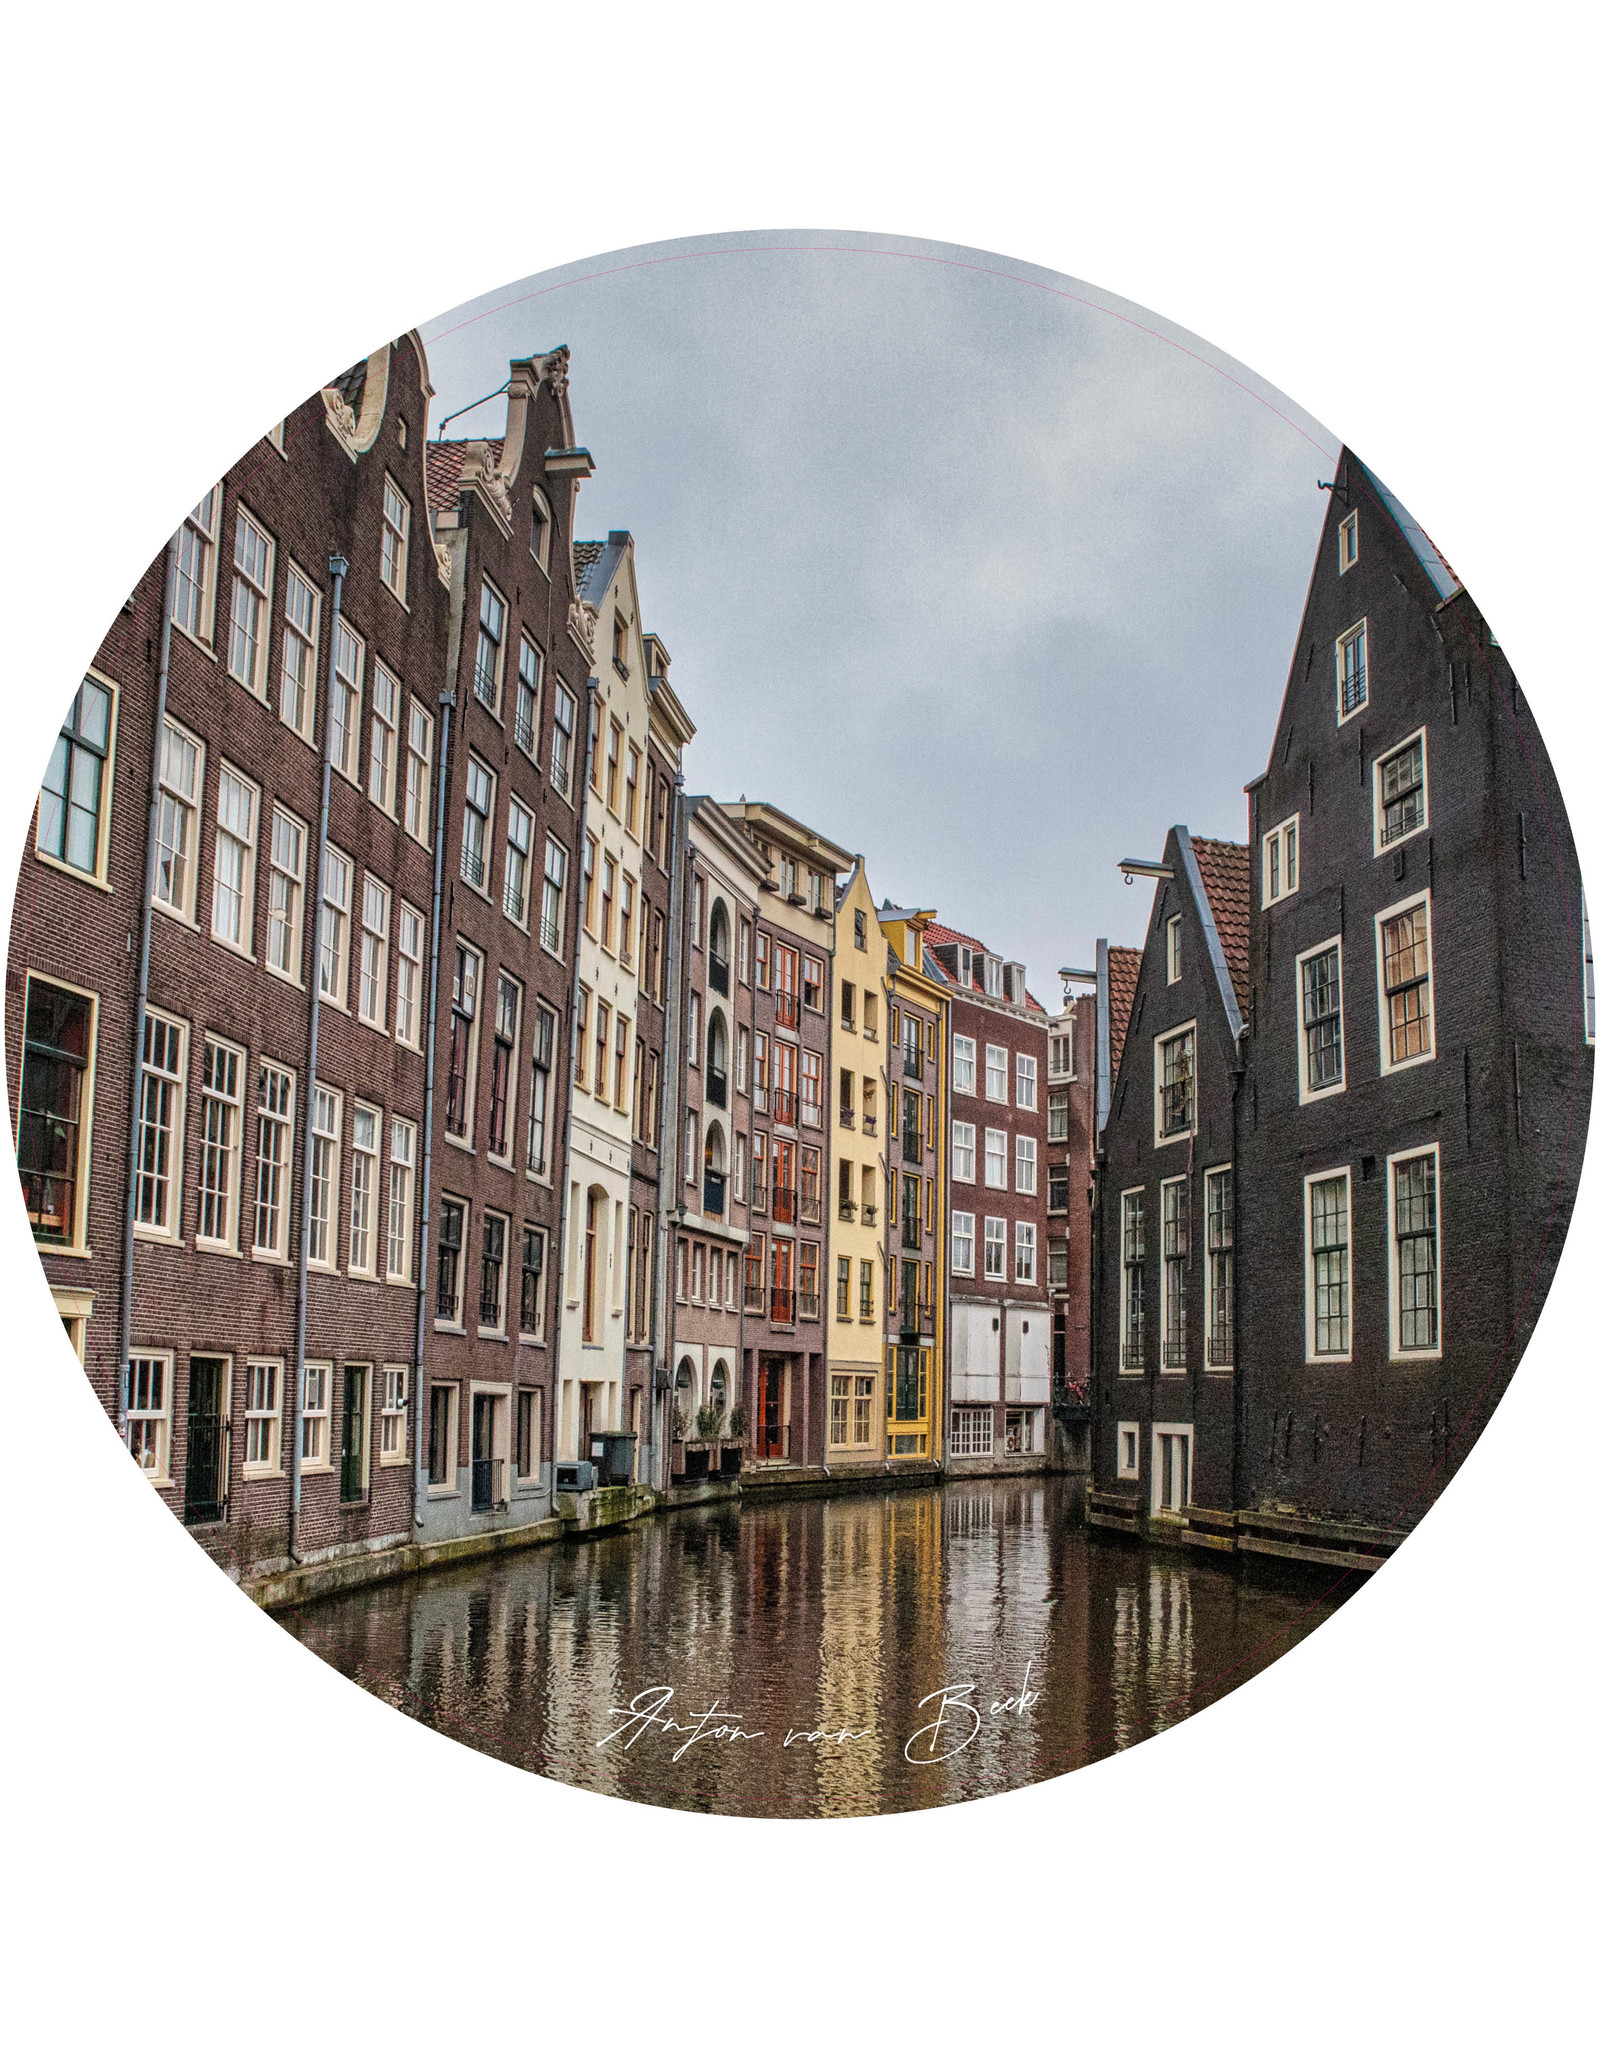 Dunnebier Home Muursticker Amsterdam - verwijderbaar